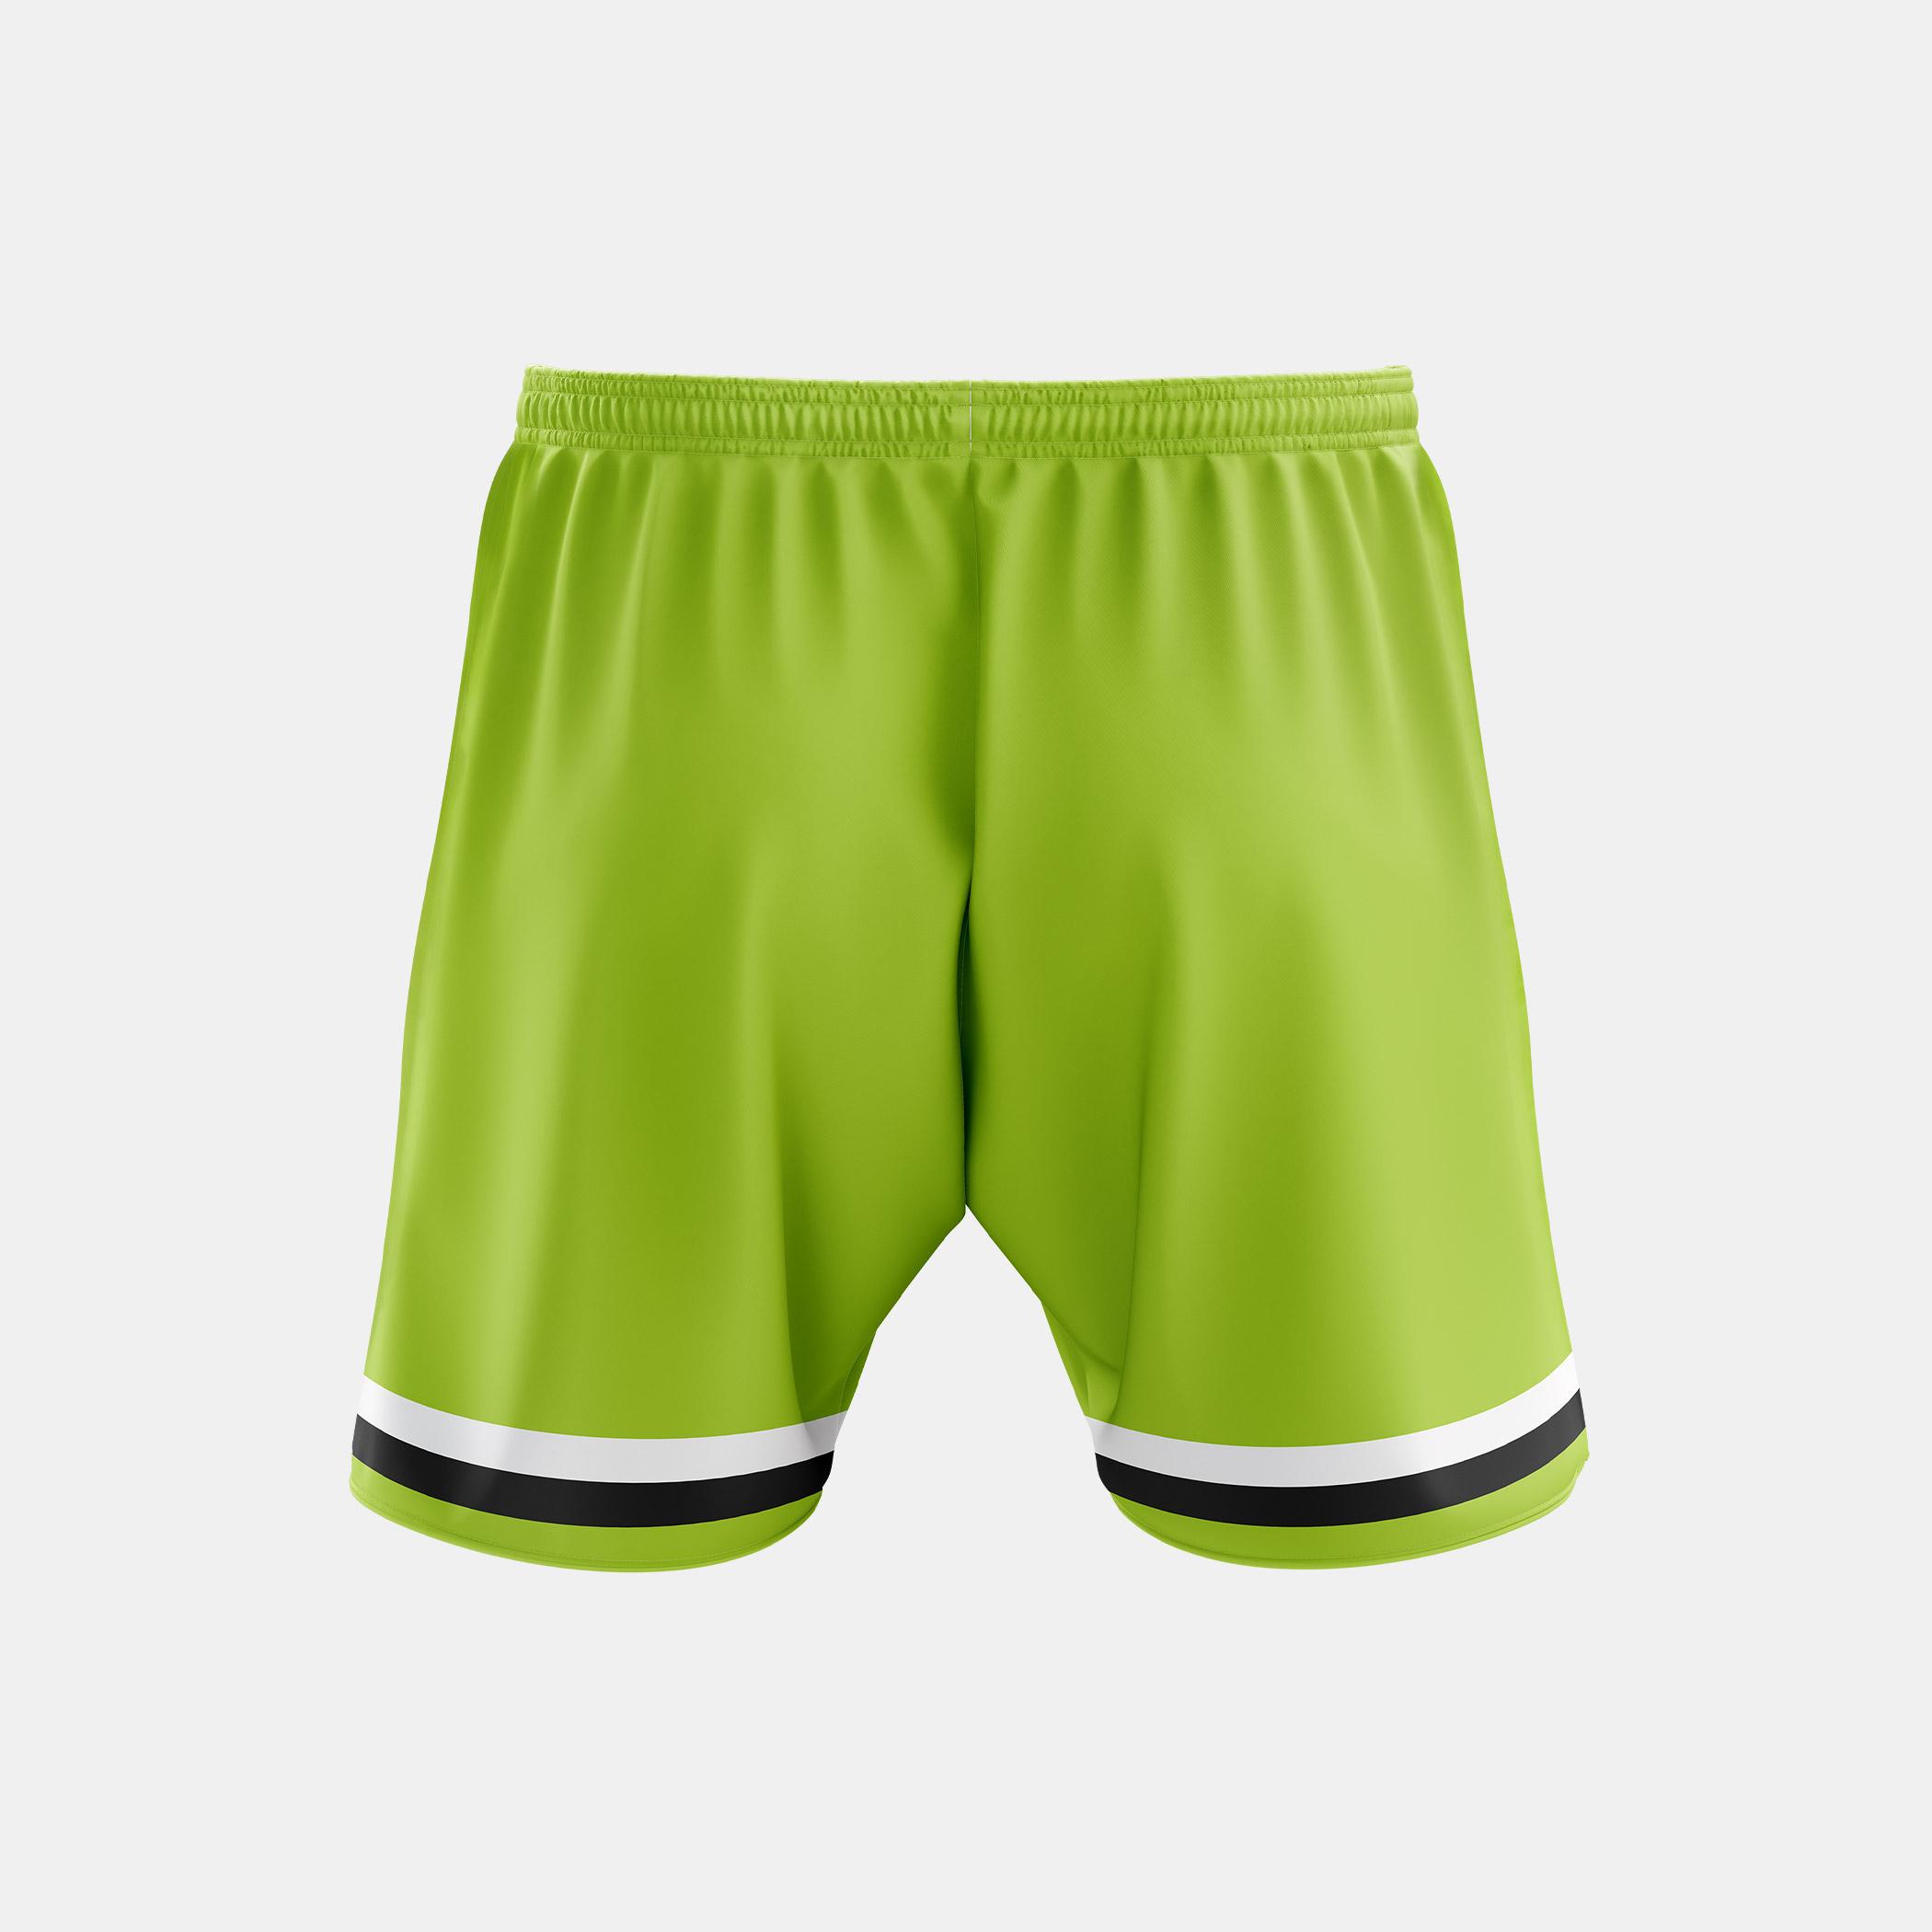 Holigans Shorts Back View